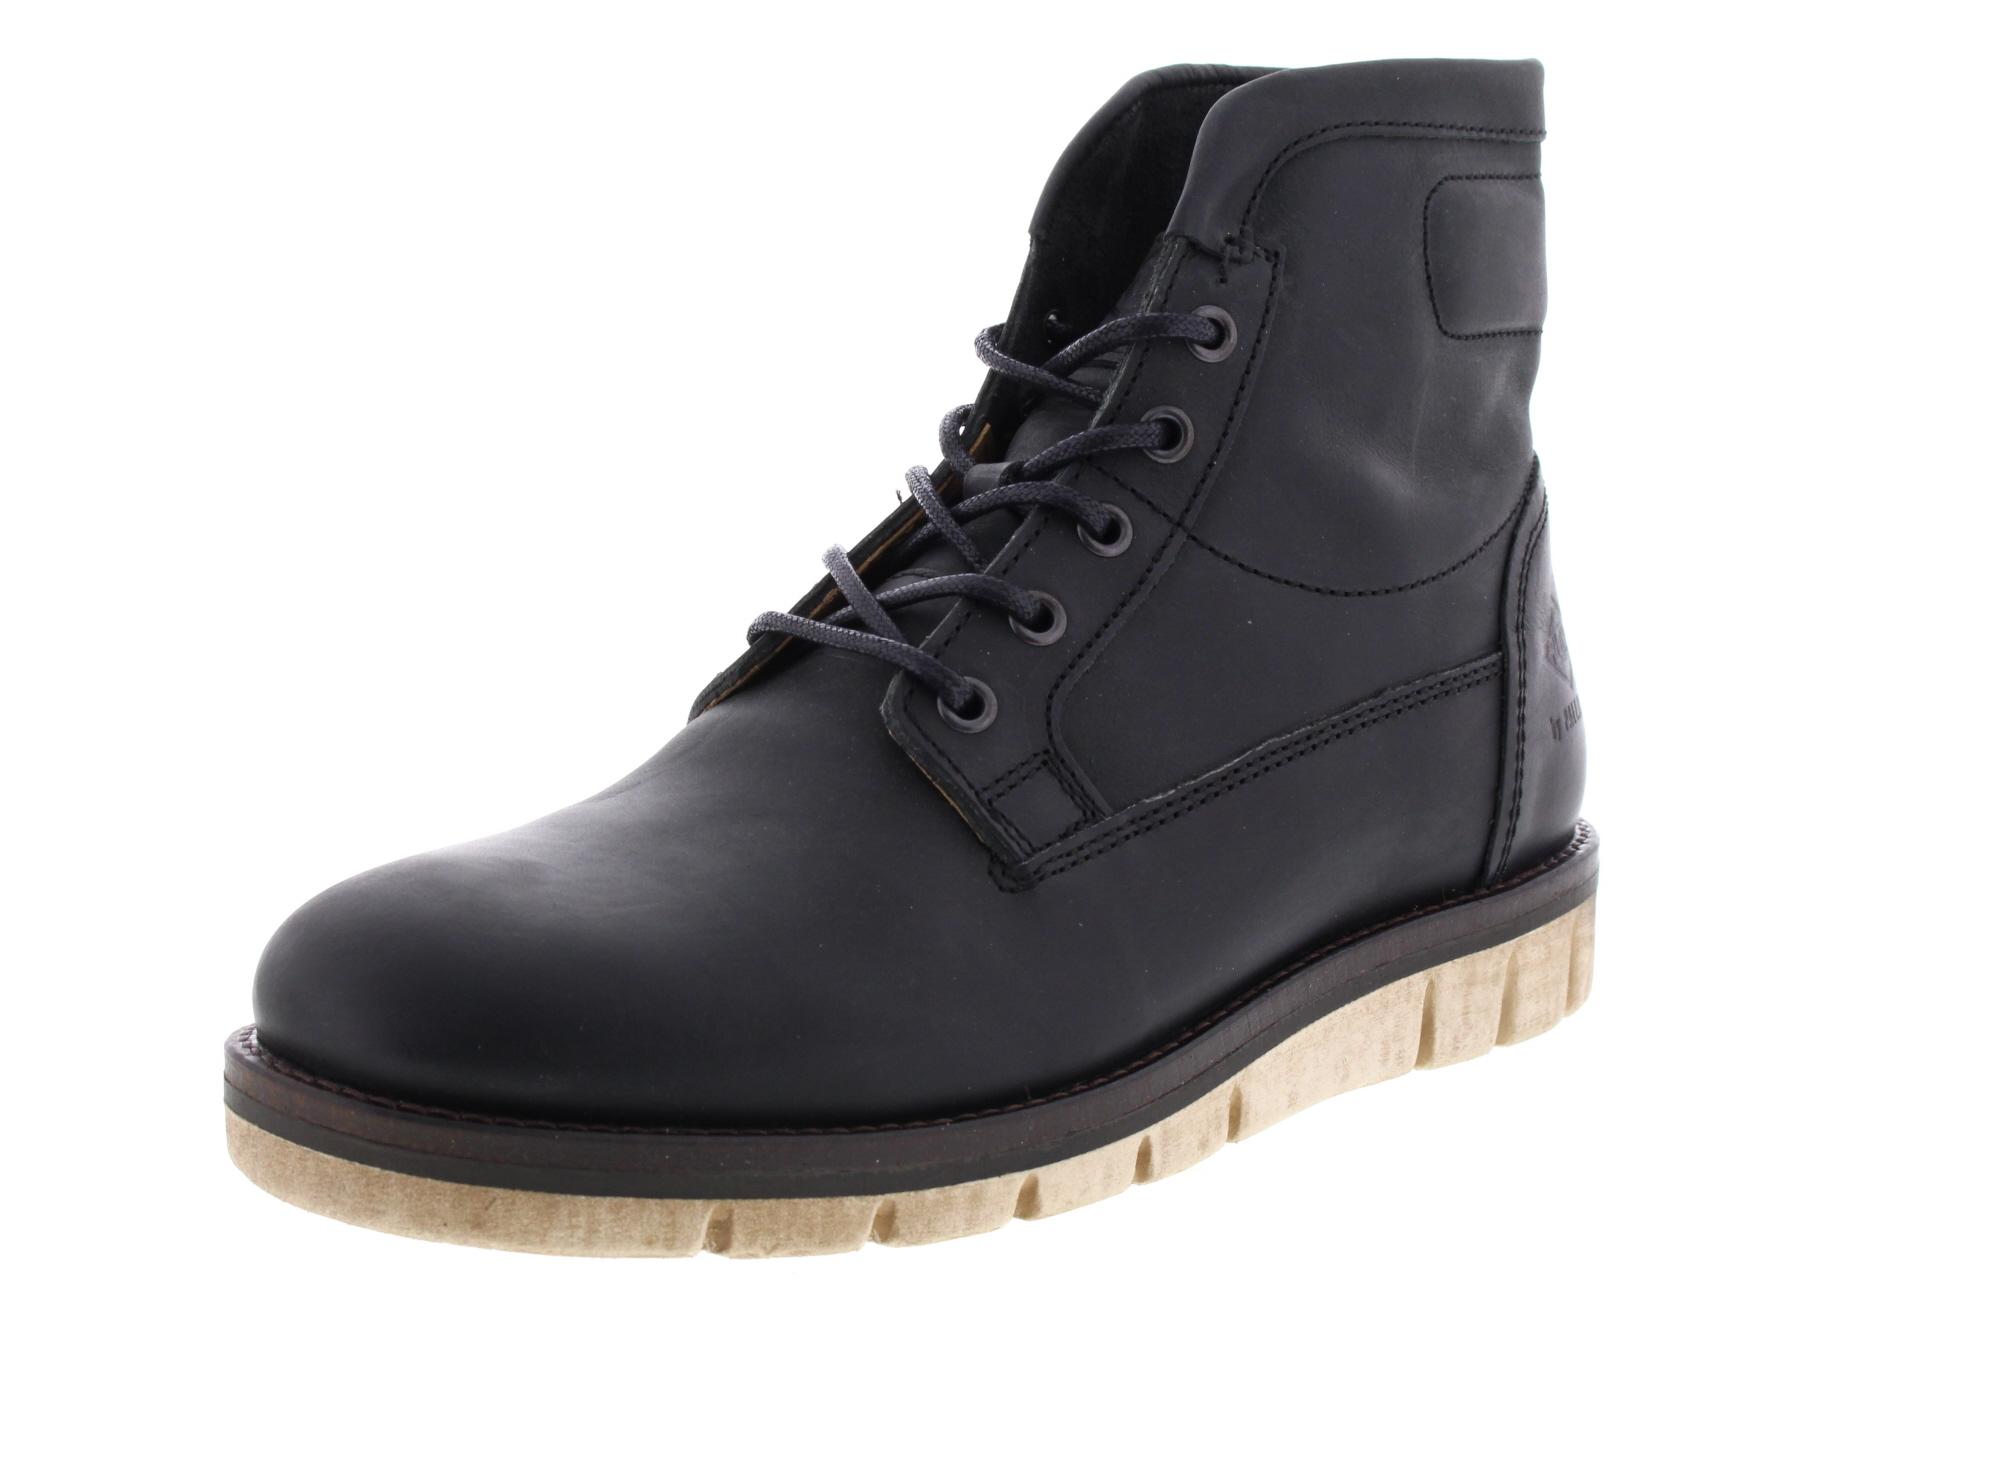 P-L-D-M by PALLADIUM Herrenschuhe Boots NORCO CSR black_0